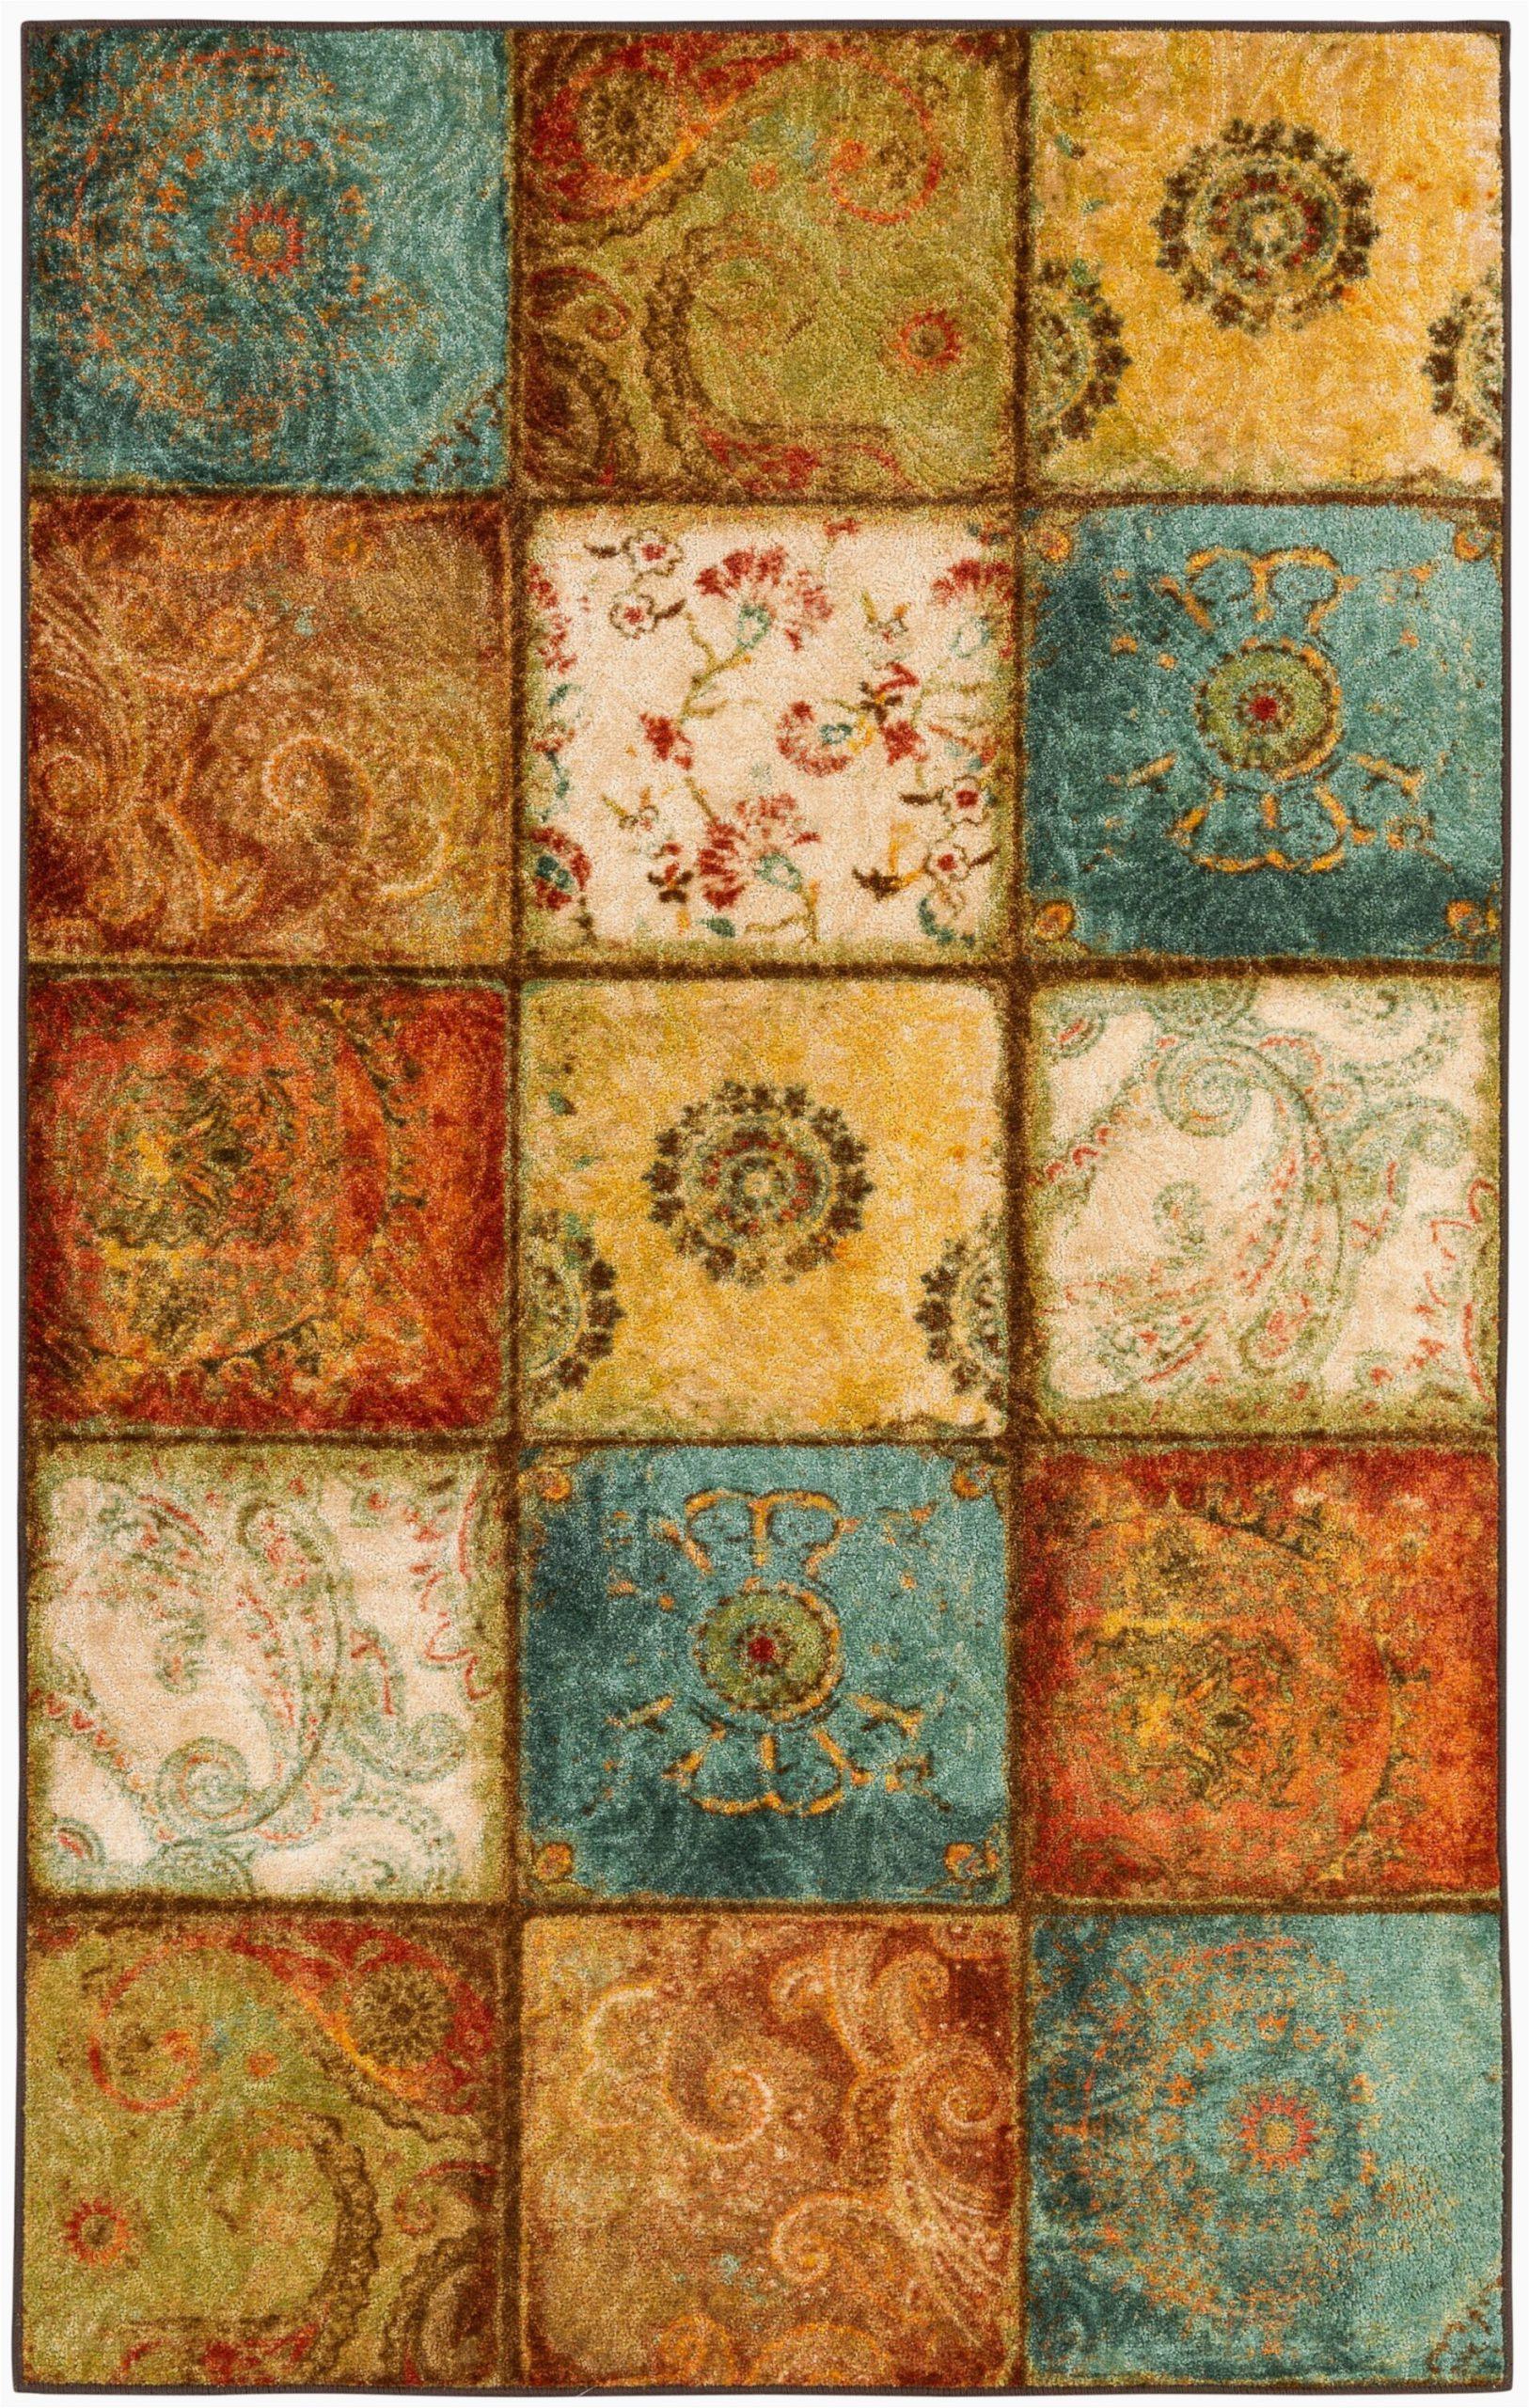 genevra floralgeometricpaisley rust redroyal bluegold area rug